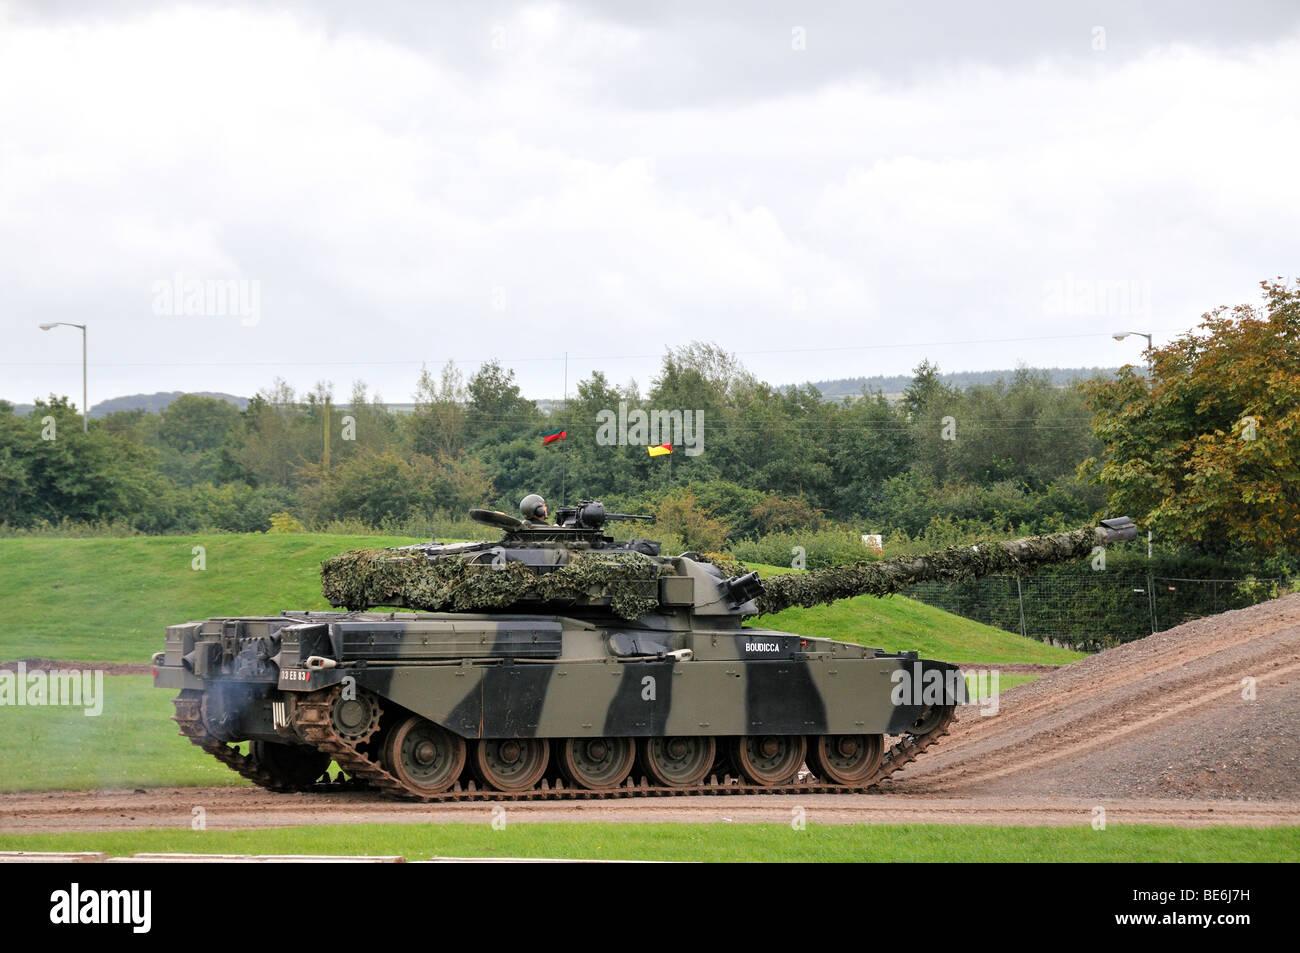 Chieftain British military tank. - Stock Image